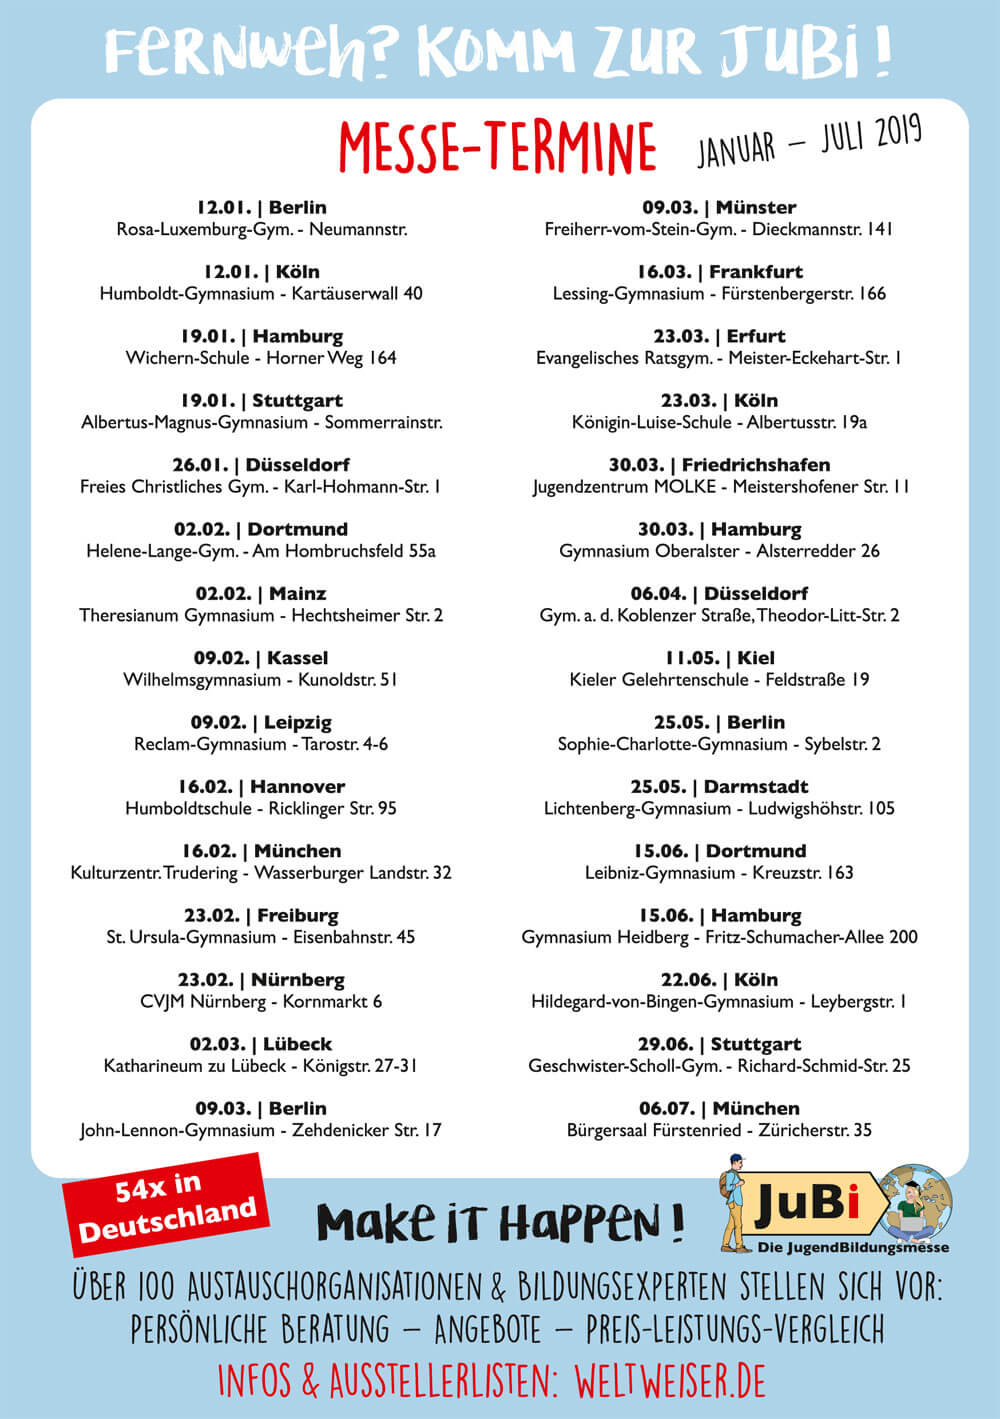 JugendBildungsmesse · Flyer · Rückseite · Termine JugendBildungsmesse 2019